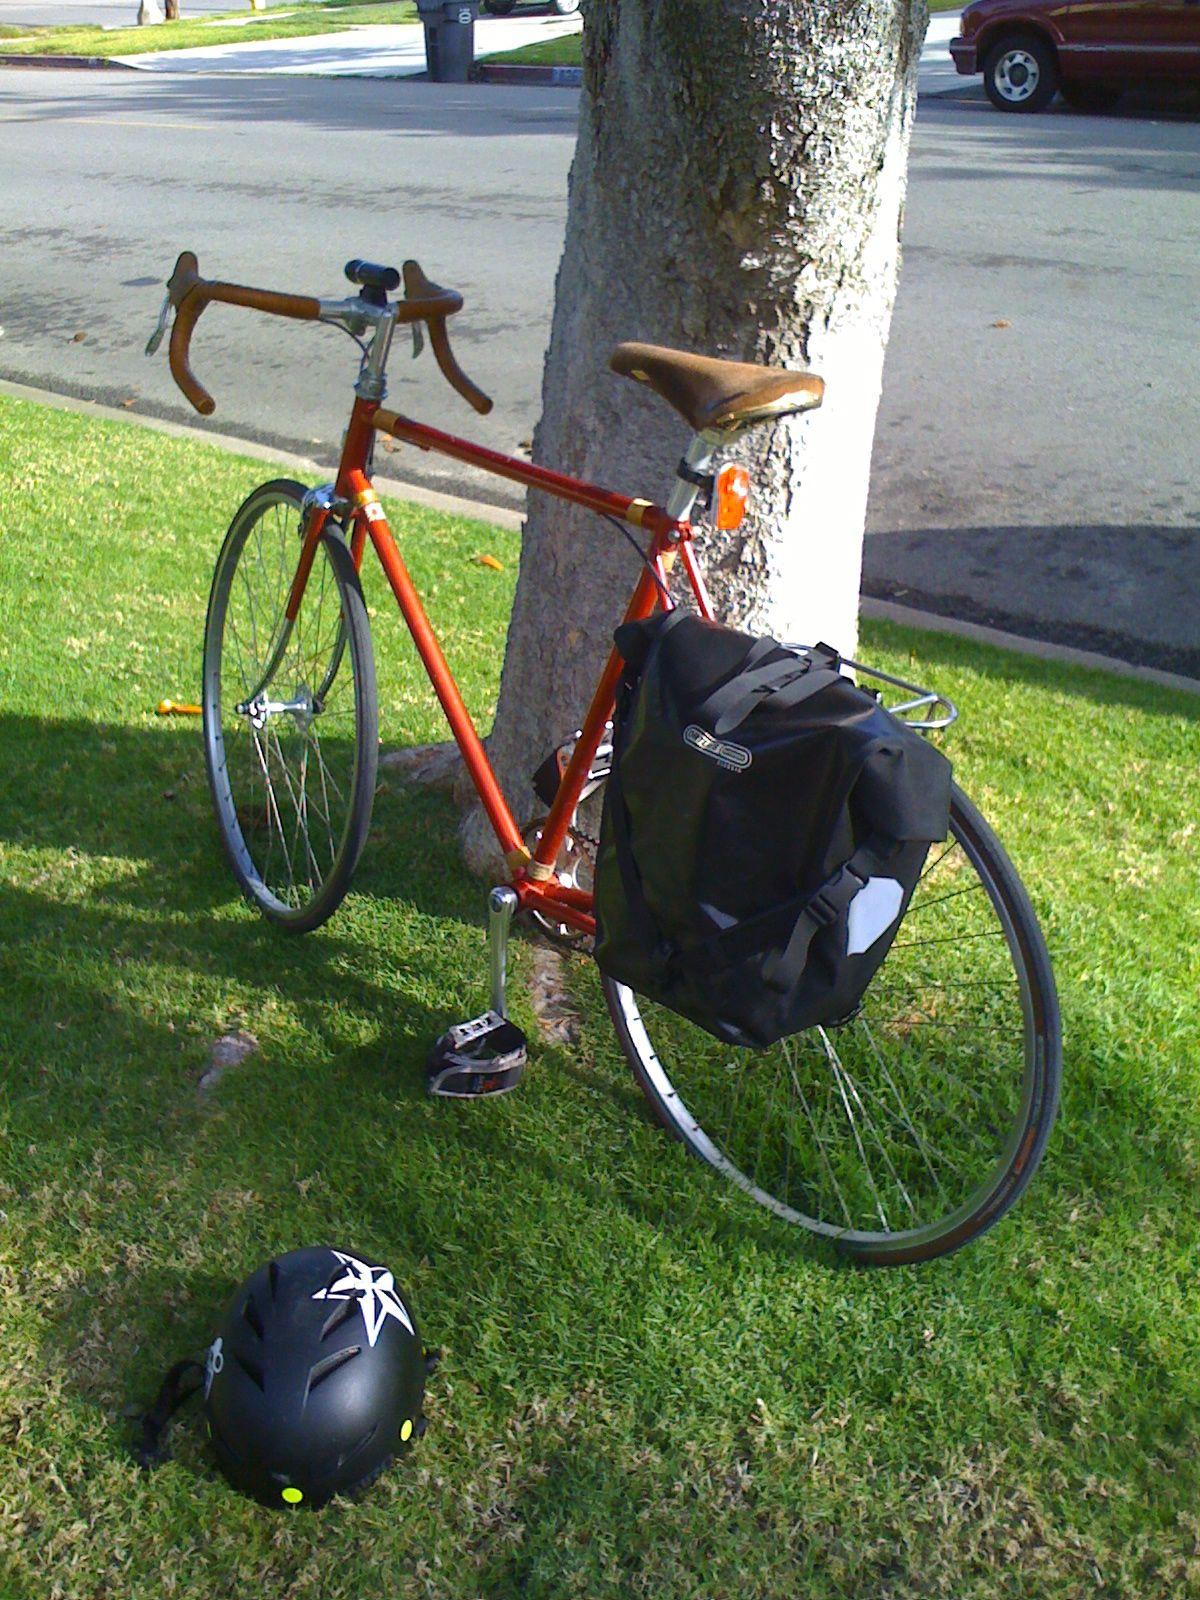 Bike Snob Lone Wolf While this bike works well on